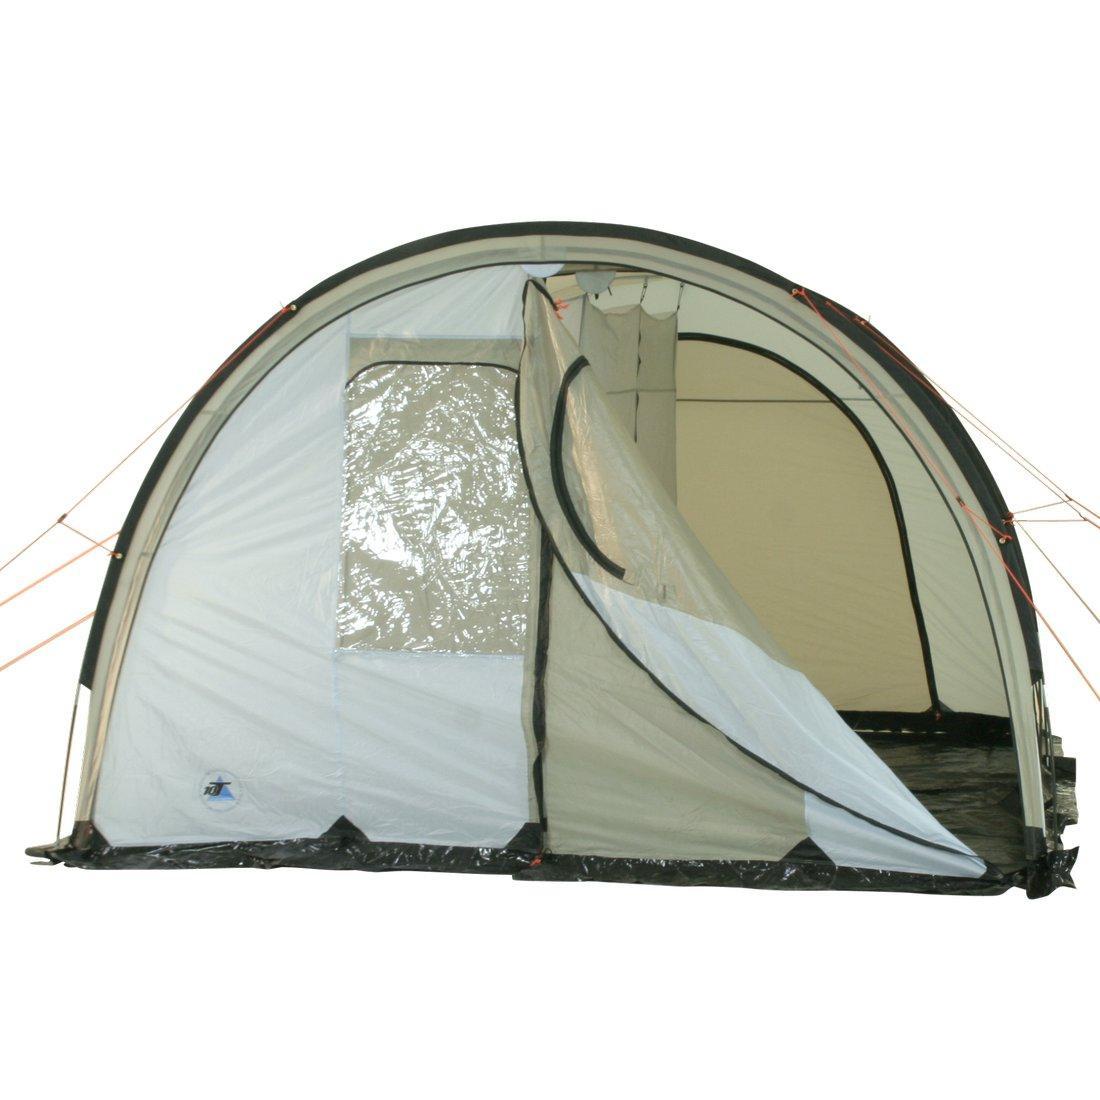 10t camping vorzelt carson freistehendes busvorzelt mit. Black Bedroom Furniture Sets. Home Design Ideas